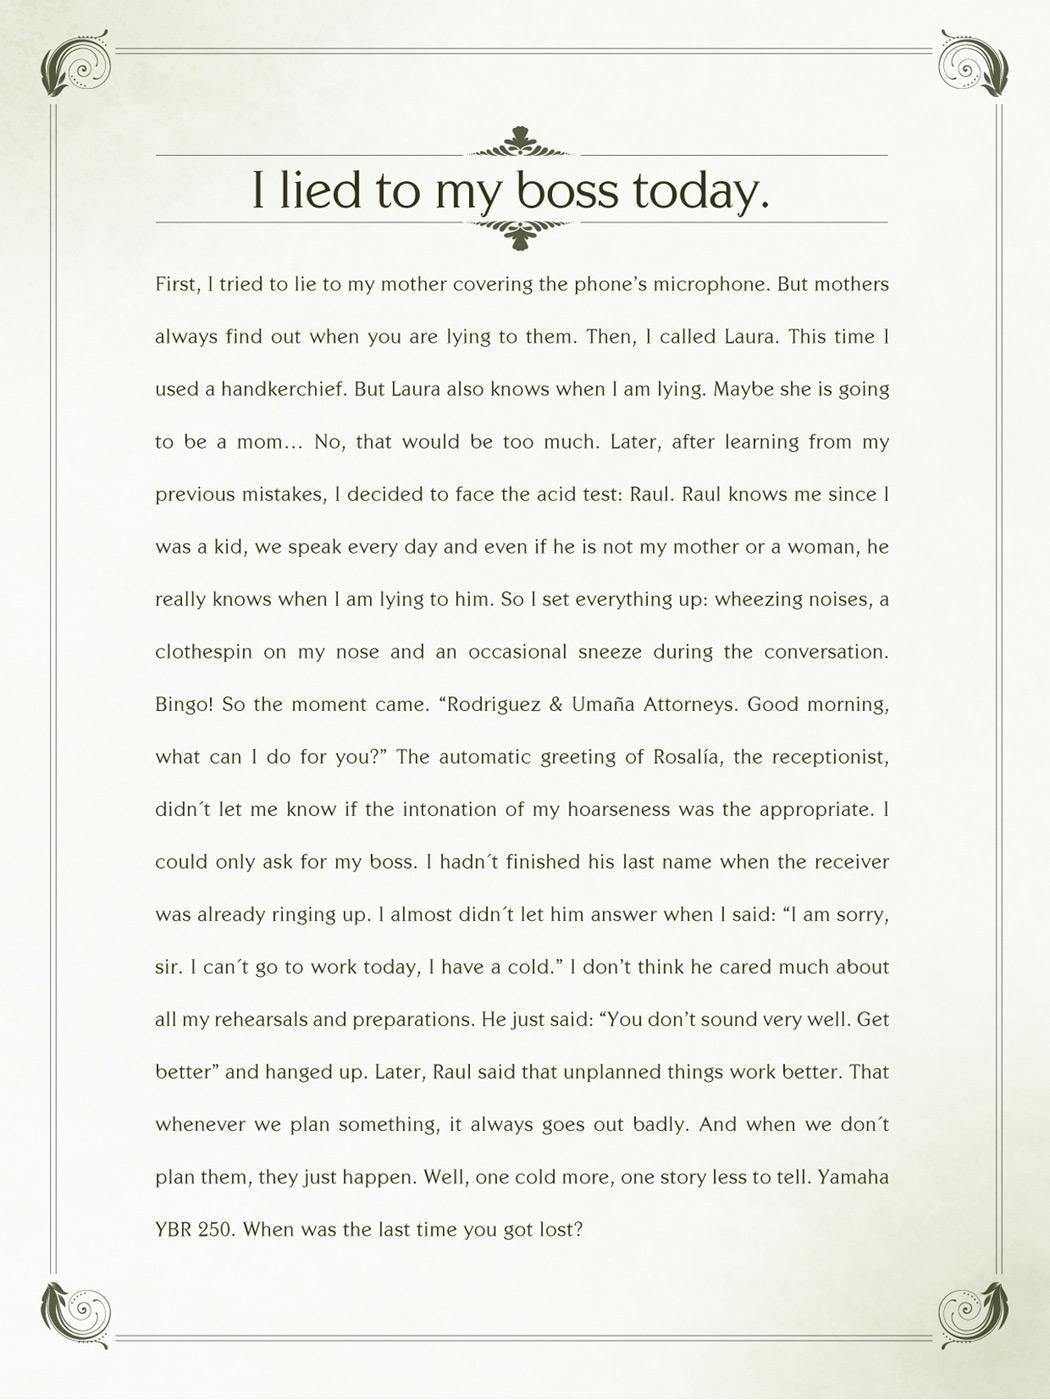 Yamaha Print Ad -  I lied to my boss